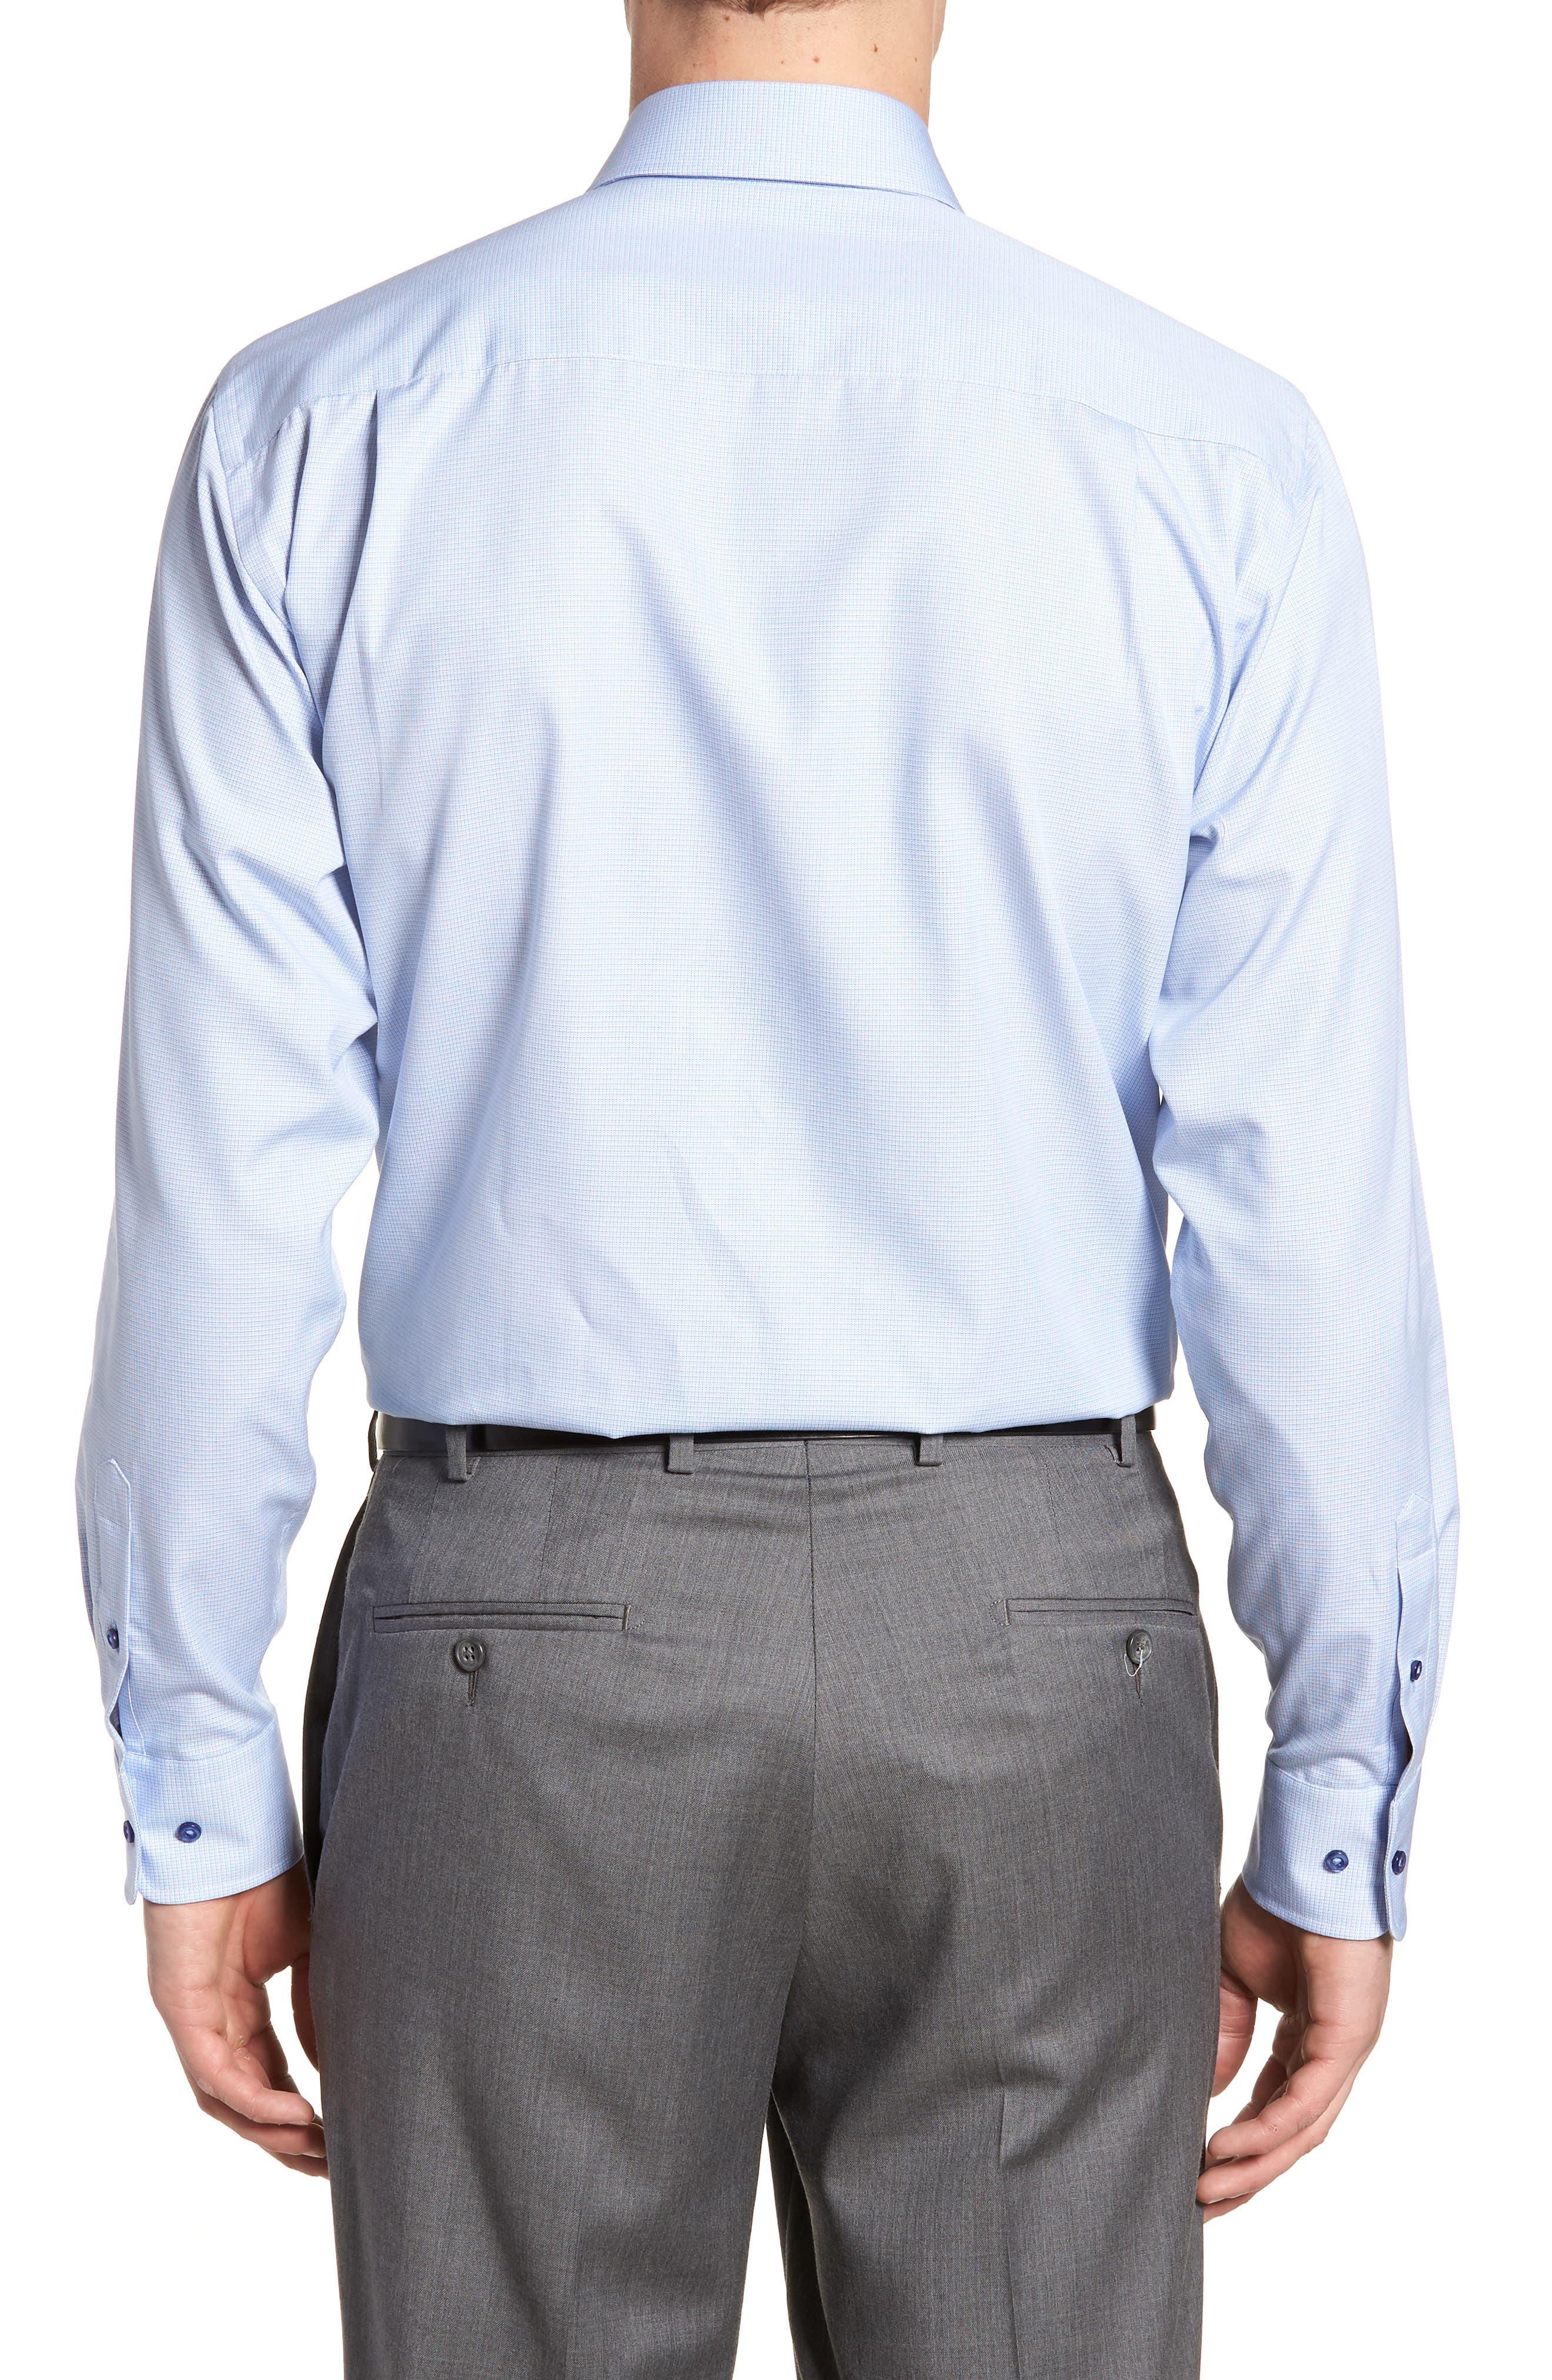 Regular Fit Solid Dress Shirt,                             Alternate thumbnail 3, color,                             423